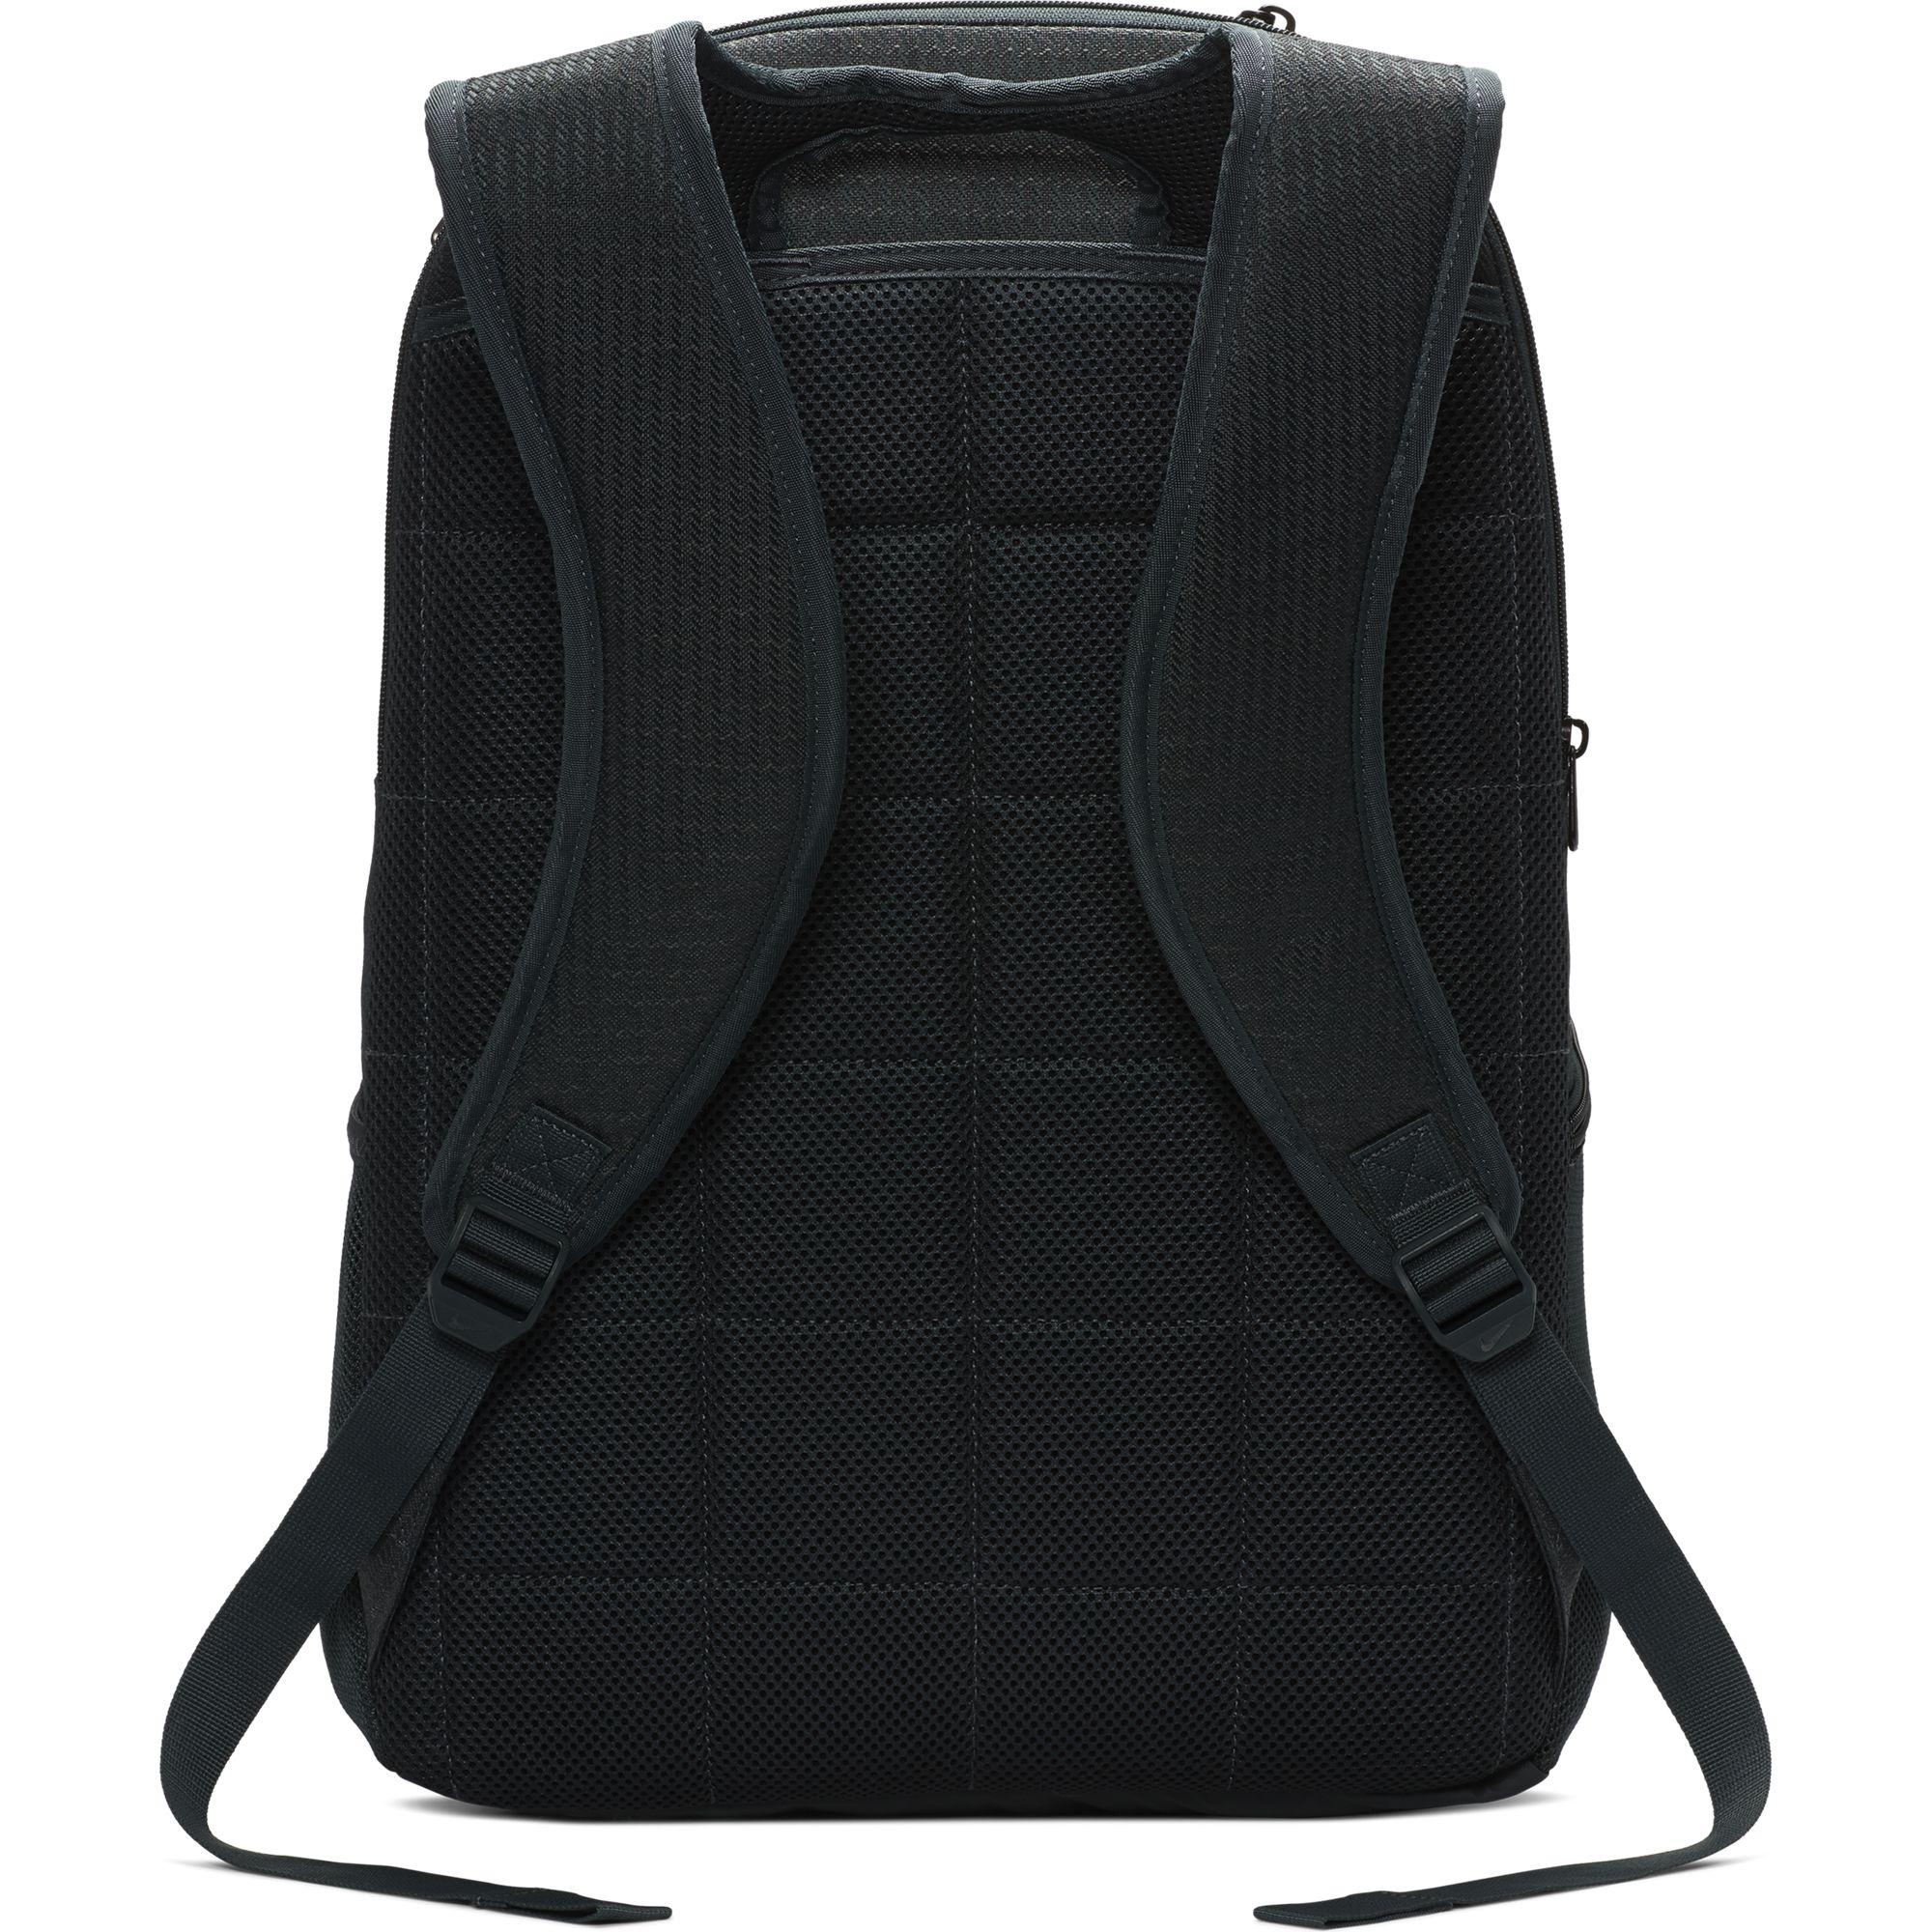 Brasilia XL Backpack, Seaweed, swatch